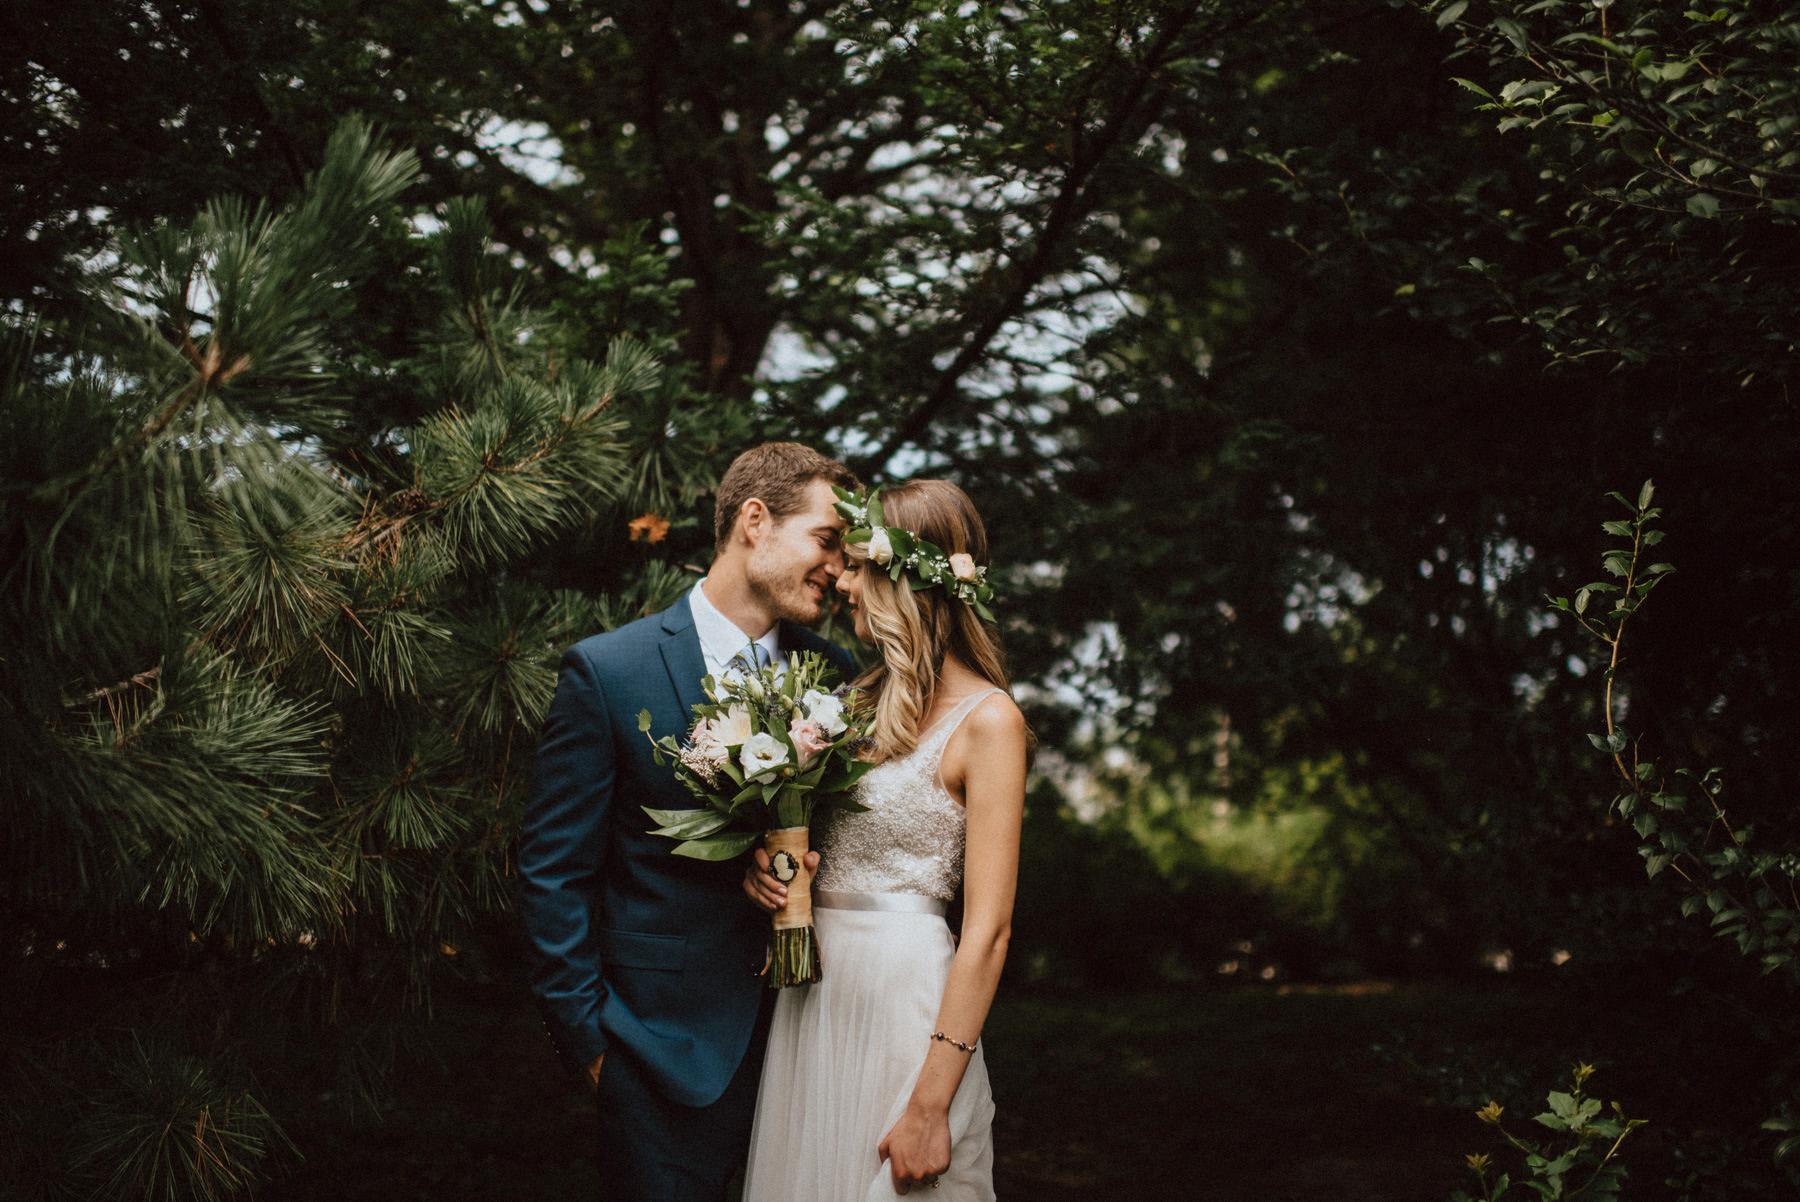 209-knowlton-mansion-wedding-11.jpg